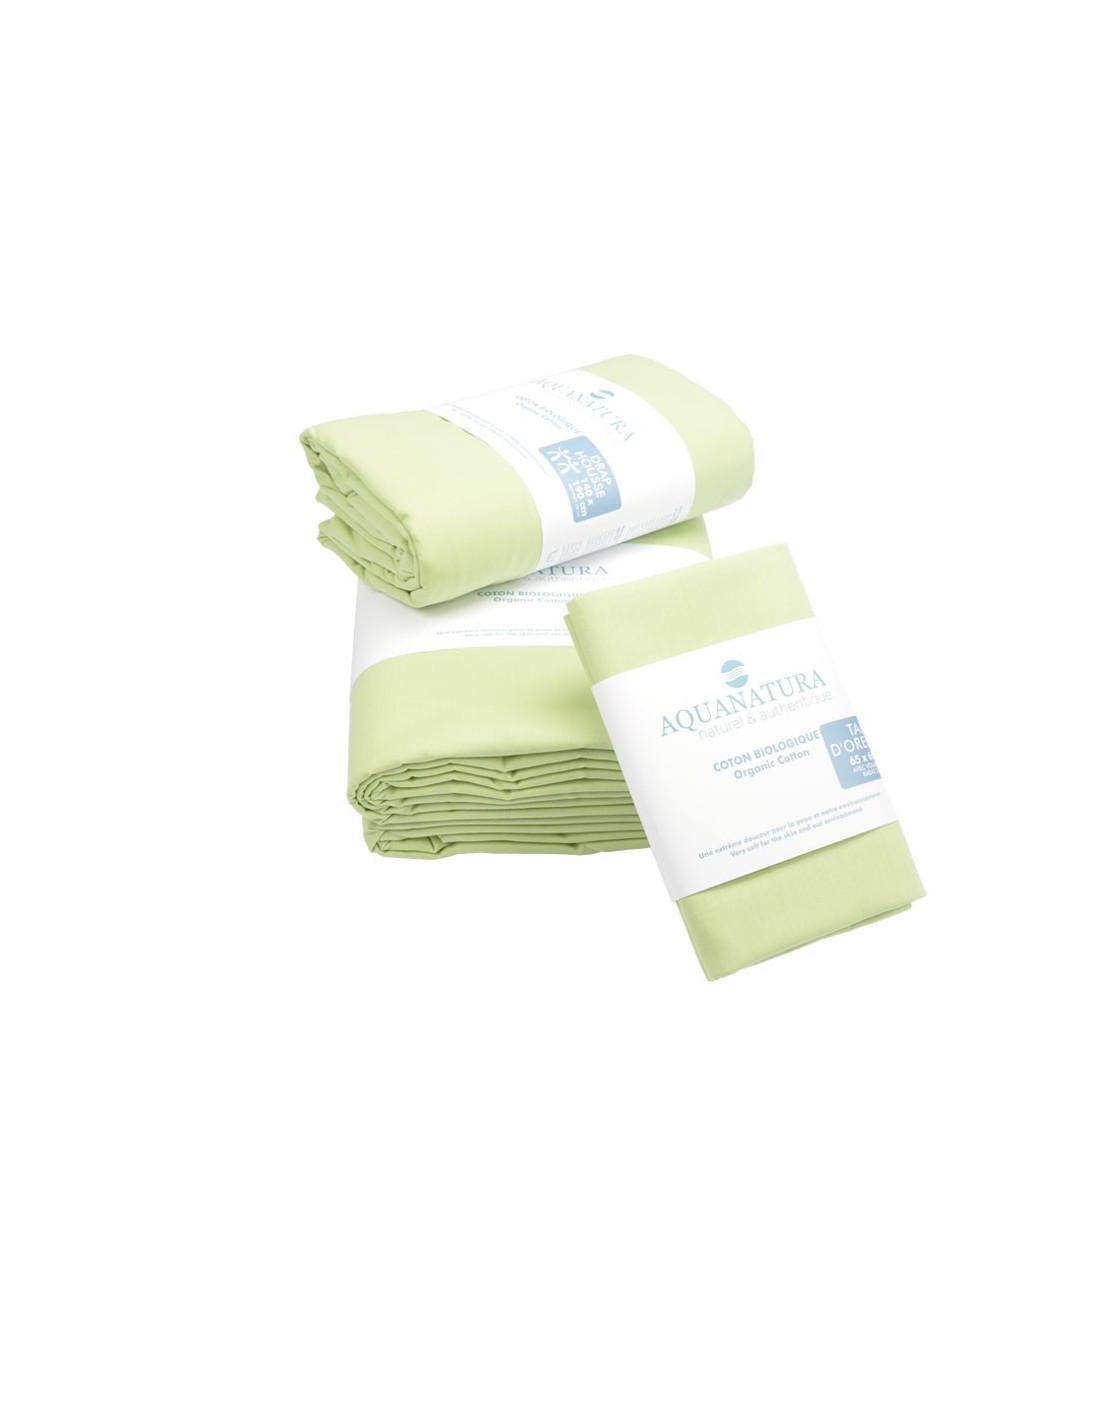 parure de draps coton bio naturel noctea. Black Bedroom Furniture Sets. Home Design Ideas